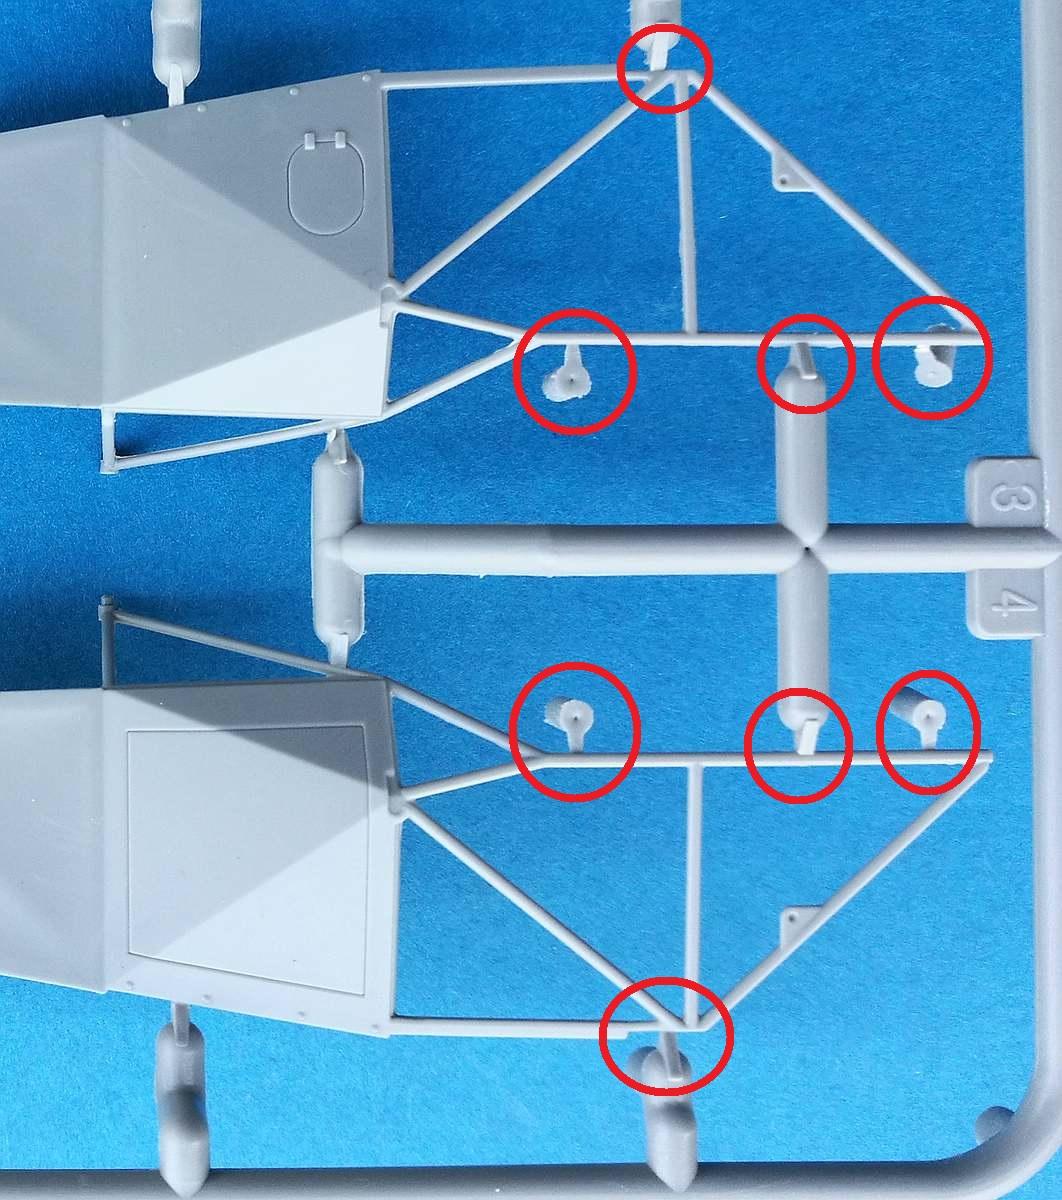 MiniArt-41001-Fl-282-V6-Kolibri-Angüsse Flettner Fl 282 V-6 Kolibri im Maßstab 1:35 von MiniArt 41001